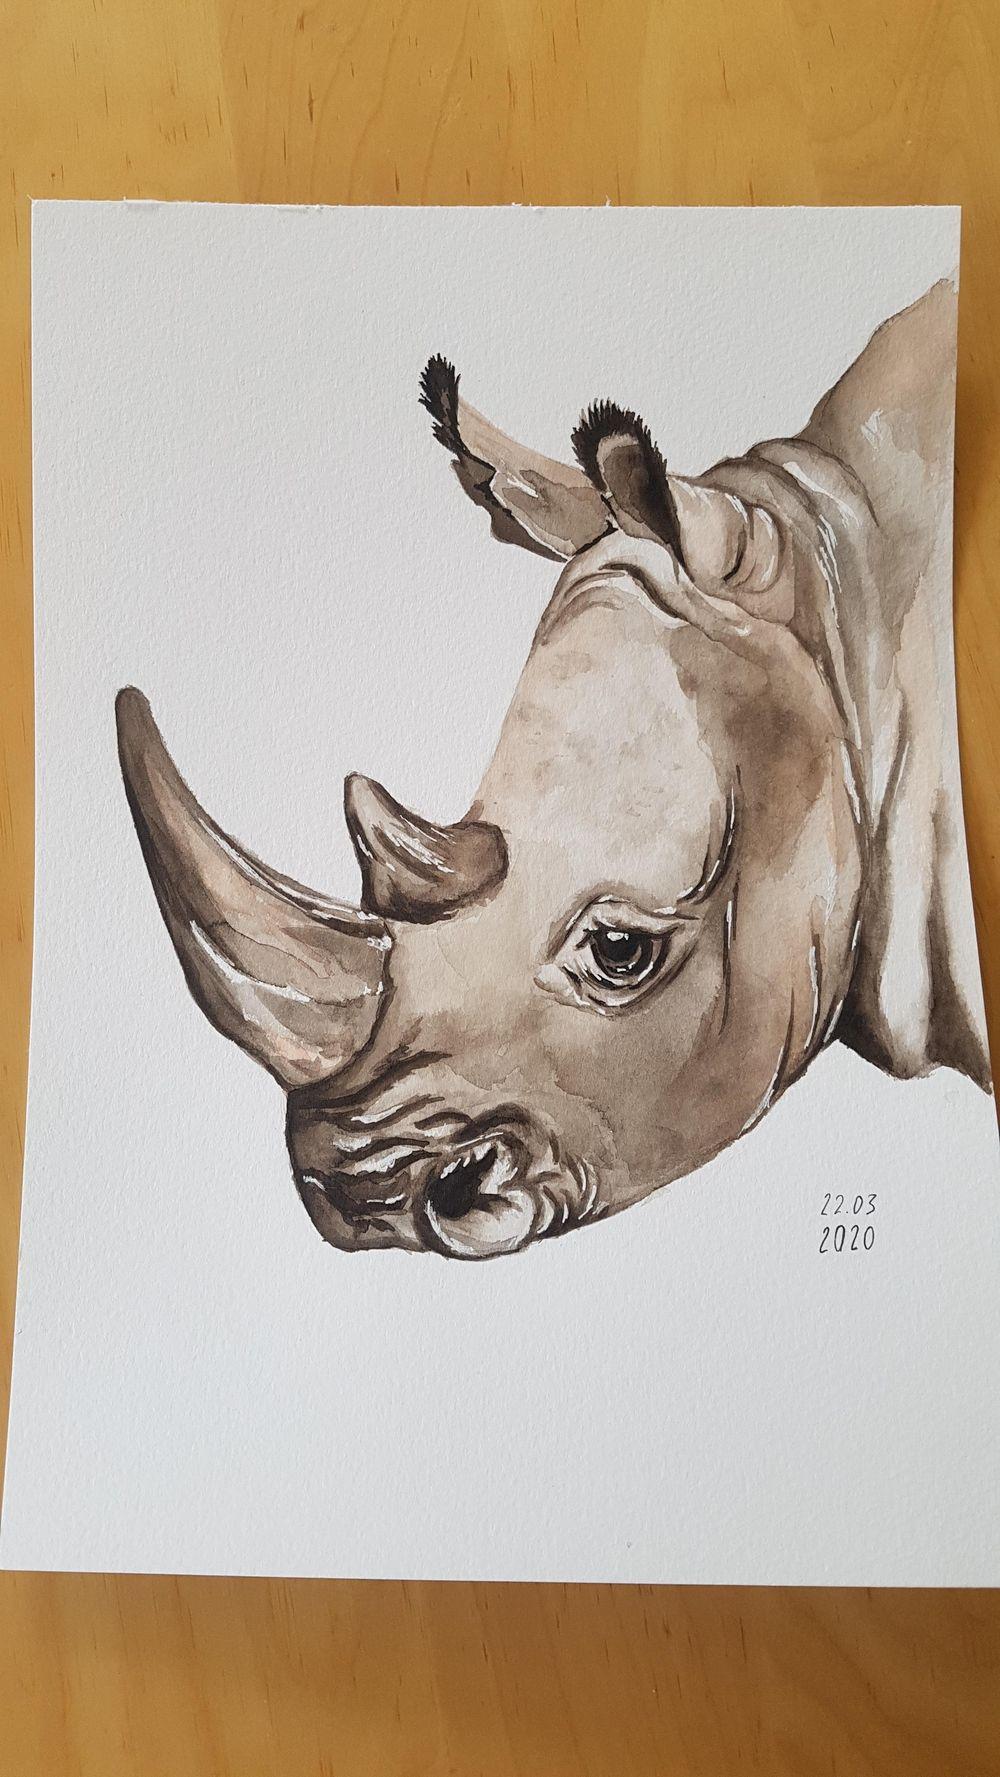 Rhinoceros - image 1 - student project